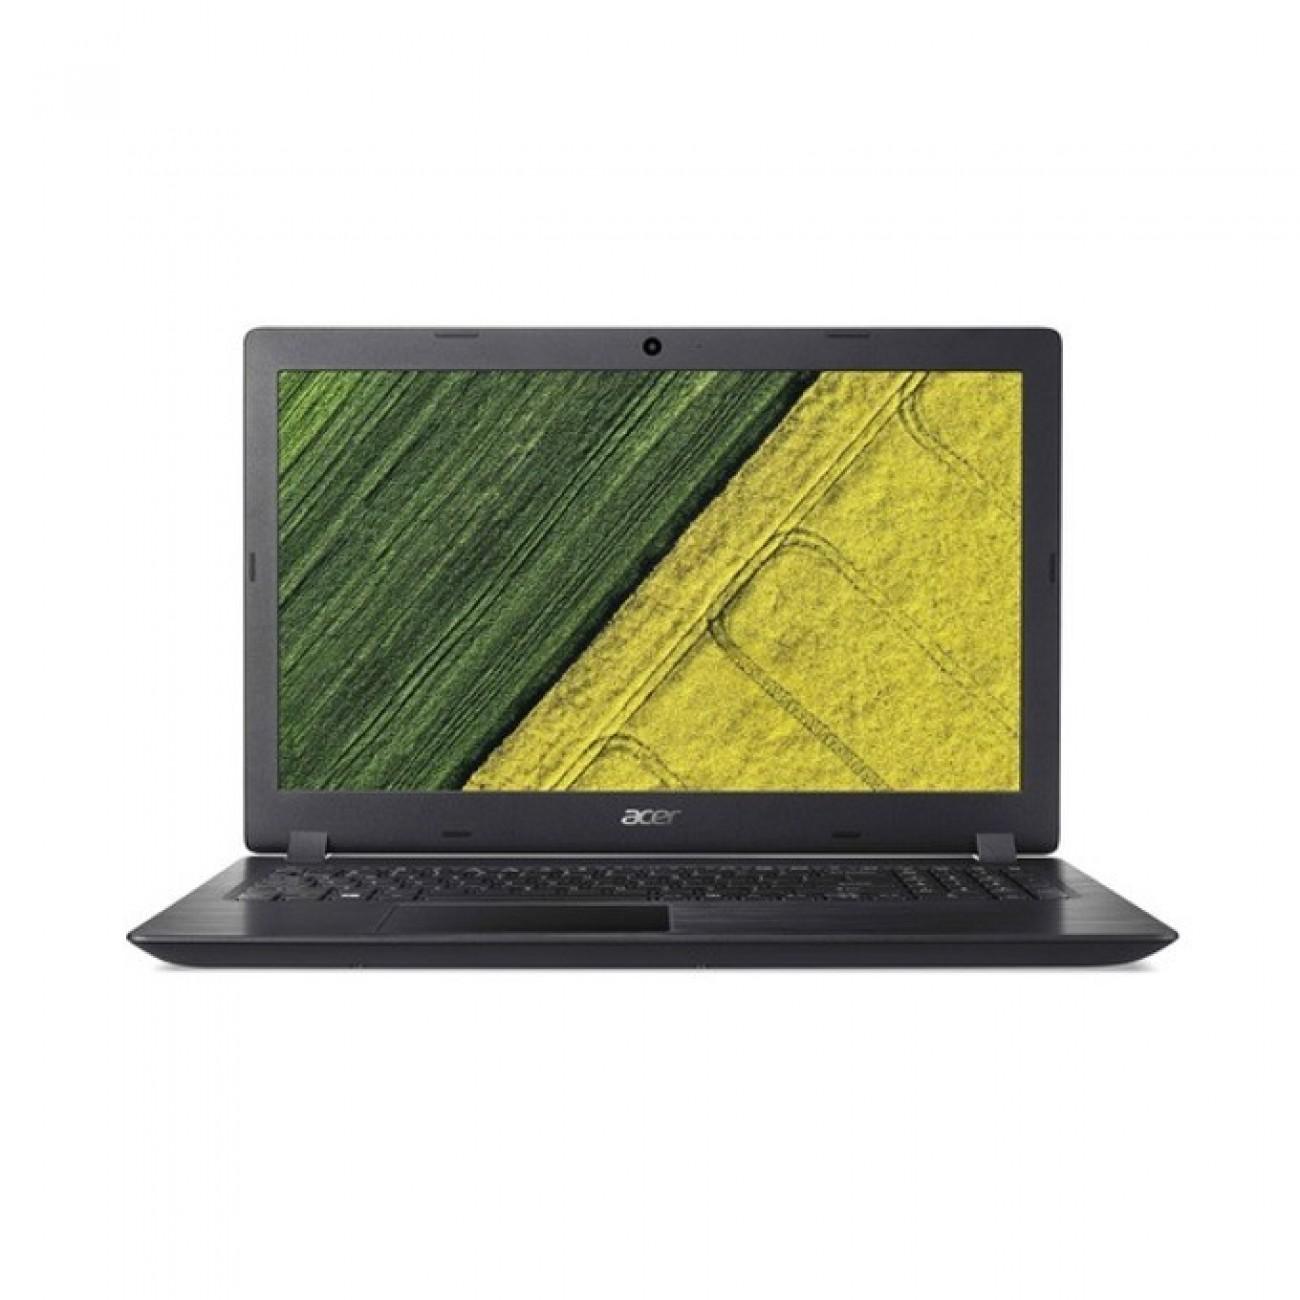 Лаптоп Acer Aspire 1 A114-32-P84R (NX.GVZEX.007), четириядрен Gemini Lake Intel Pentium N5000 1.1/2.7 GHz, 14 (35.56 cm) Full HD Anti-Glare Display, (HDMI), 4GB, 64GB eMMC, 1x USB 3.0, Windows 10 в Лаптопи -  | Alleop